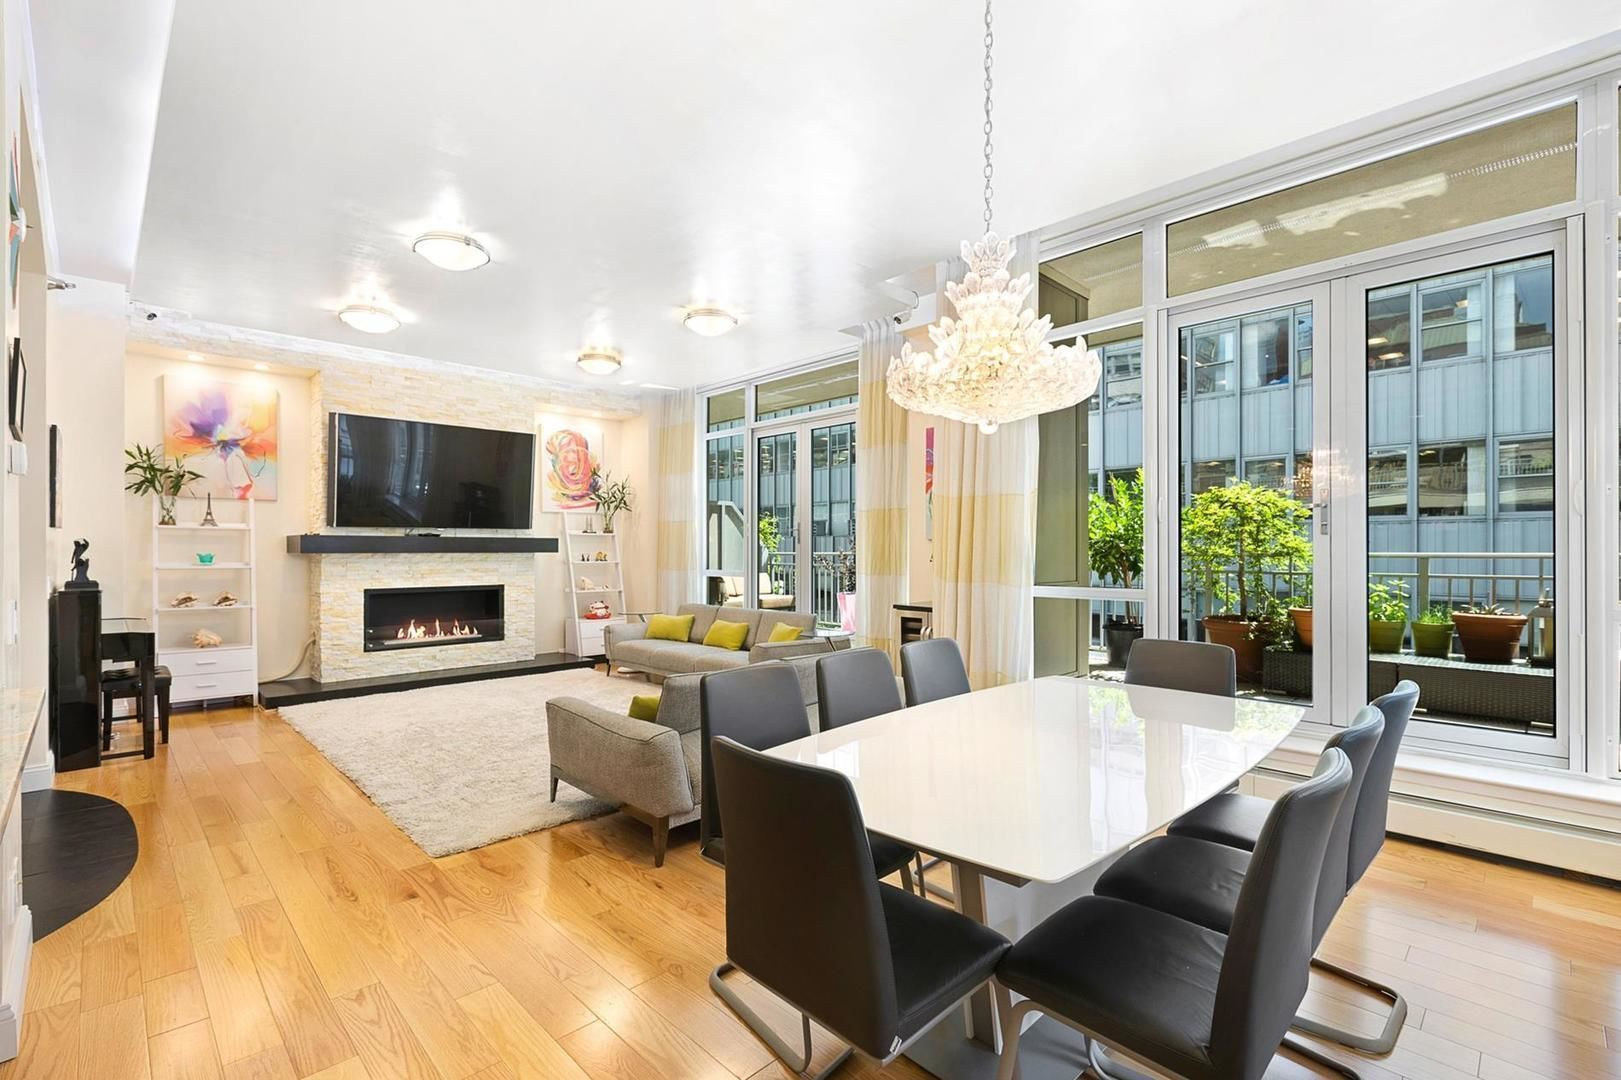 Apartment for sale at 59 John Street, Apt PH-1